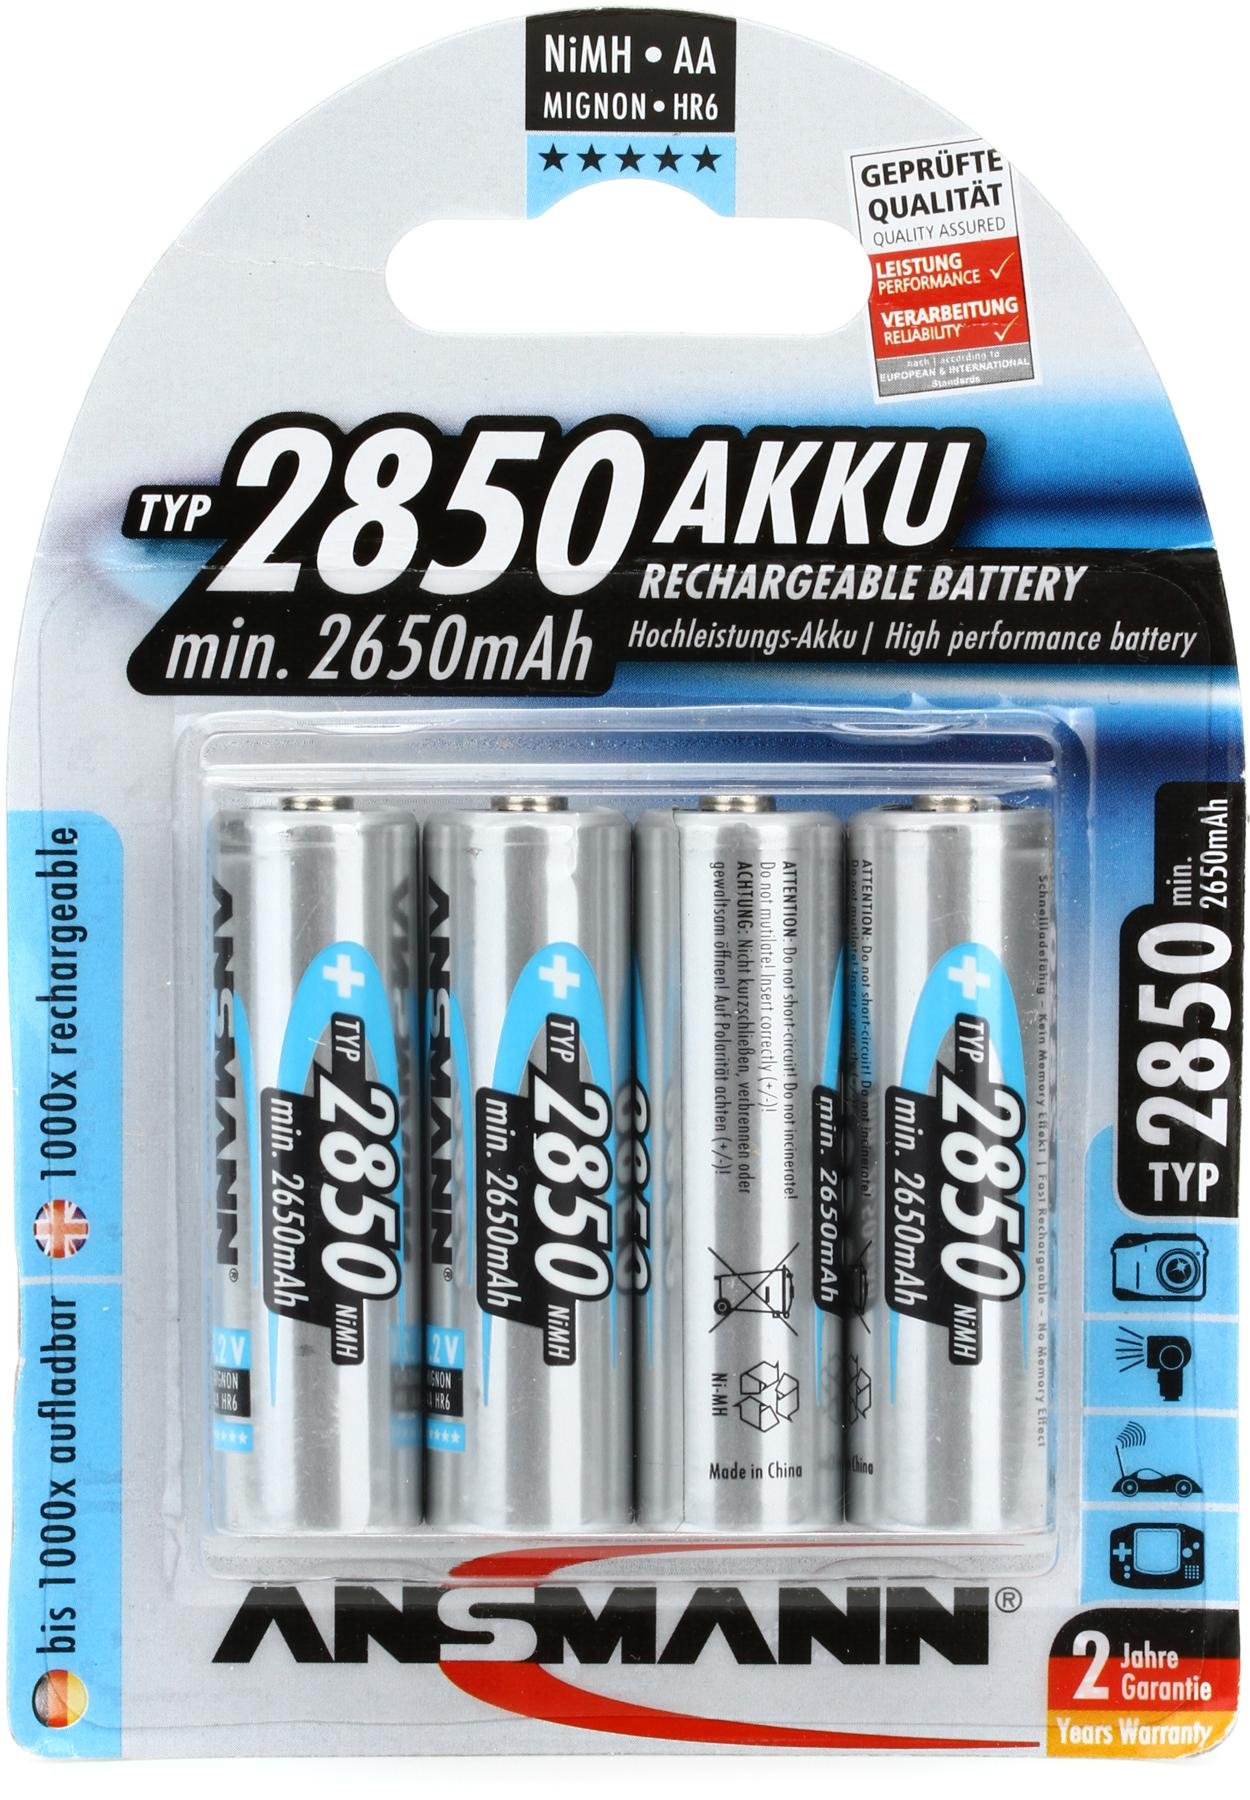 Ansmann 2850 mah AA Rechargeable Battery 4-pk | Sweetwater